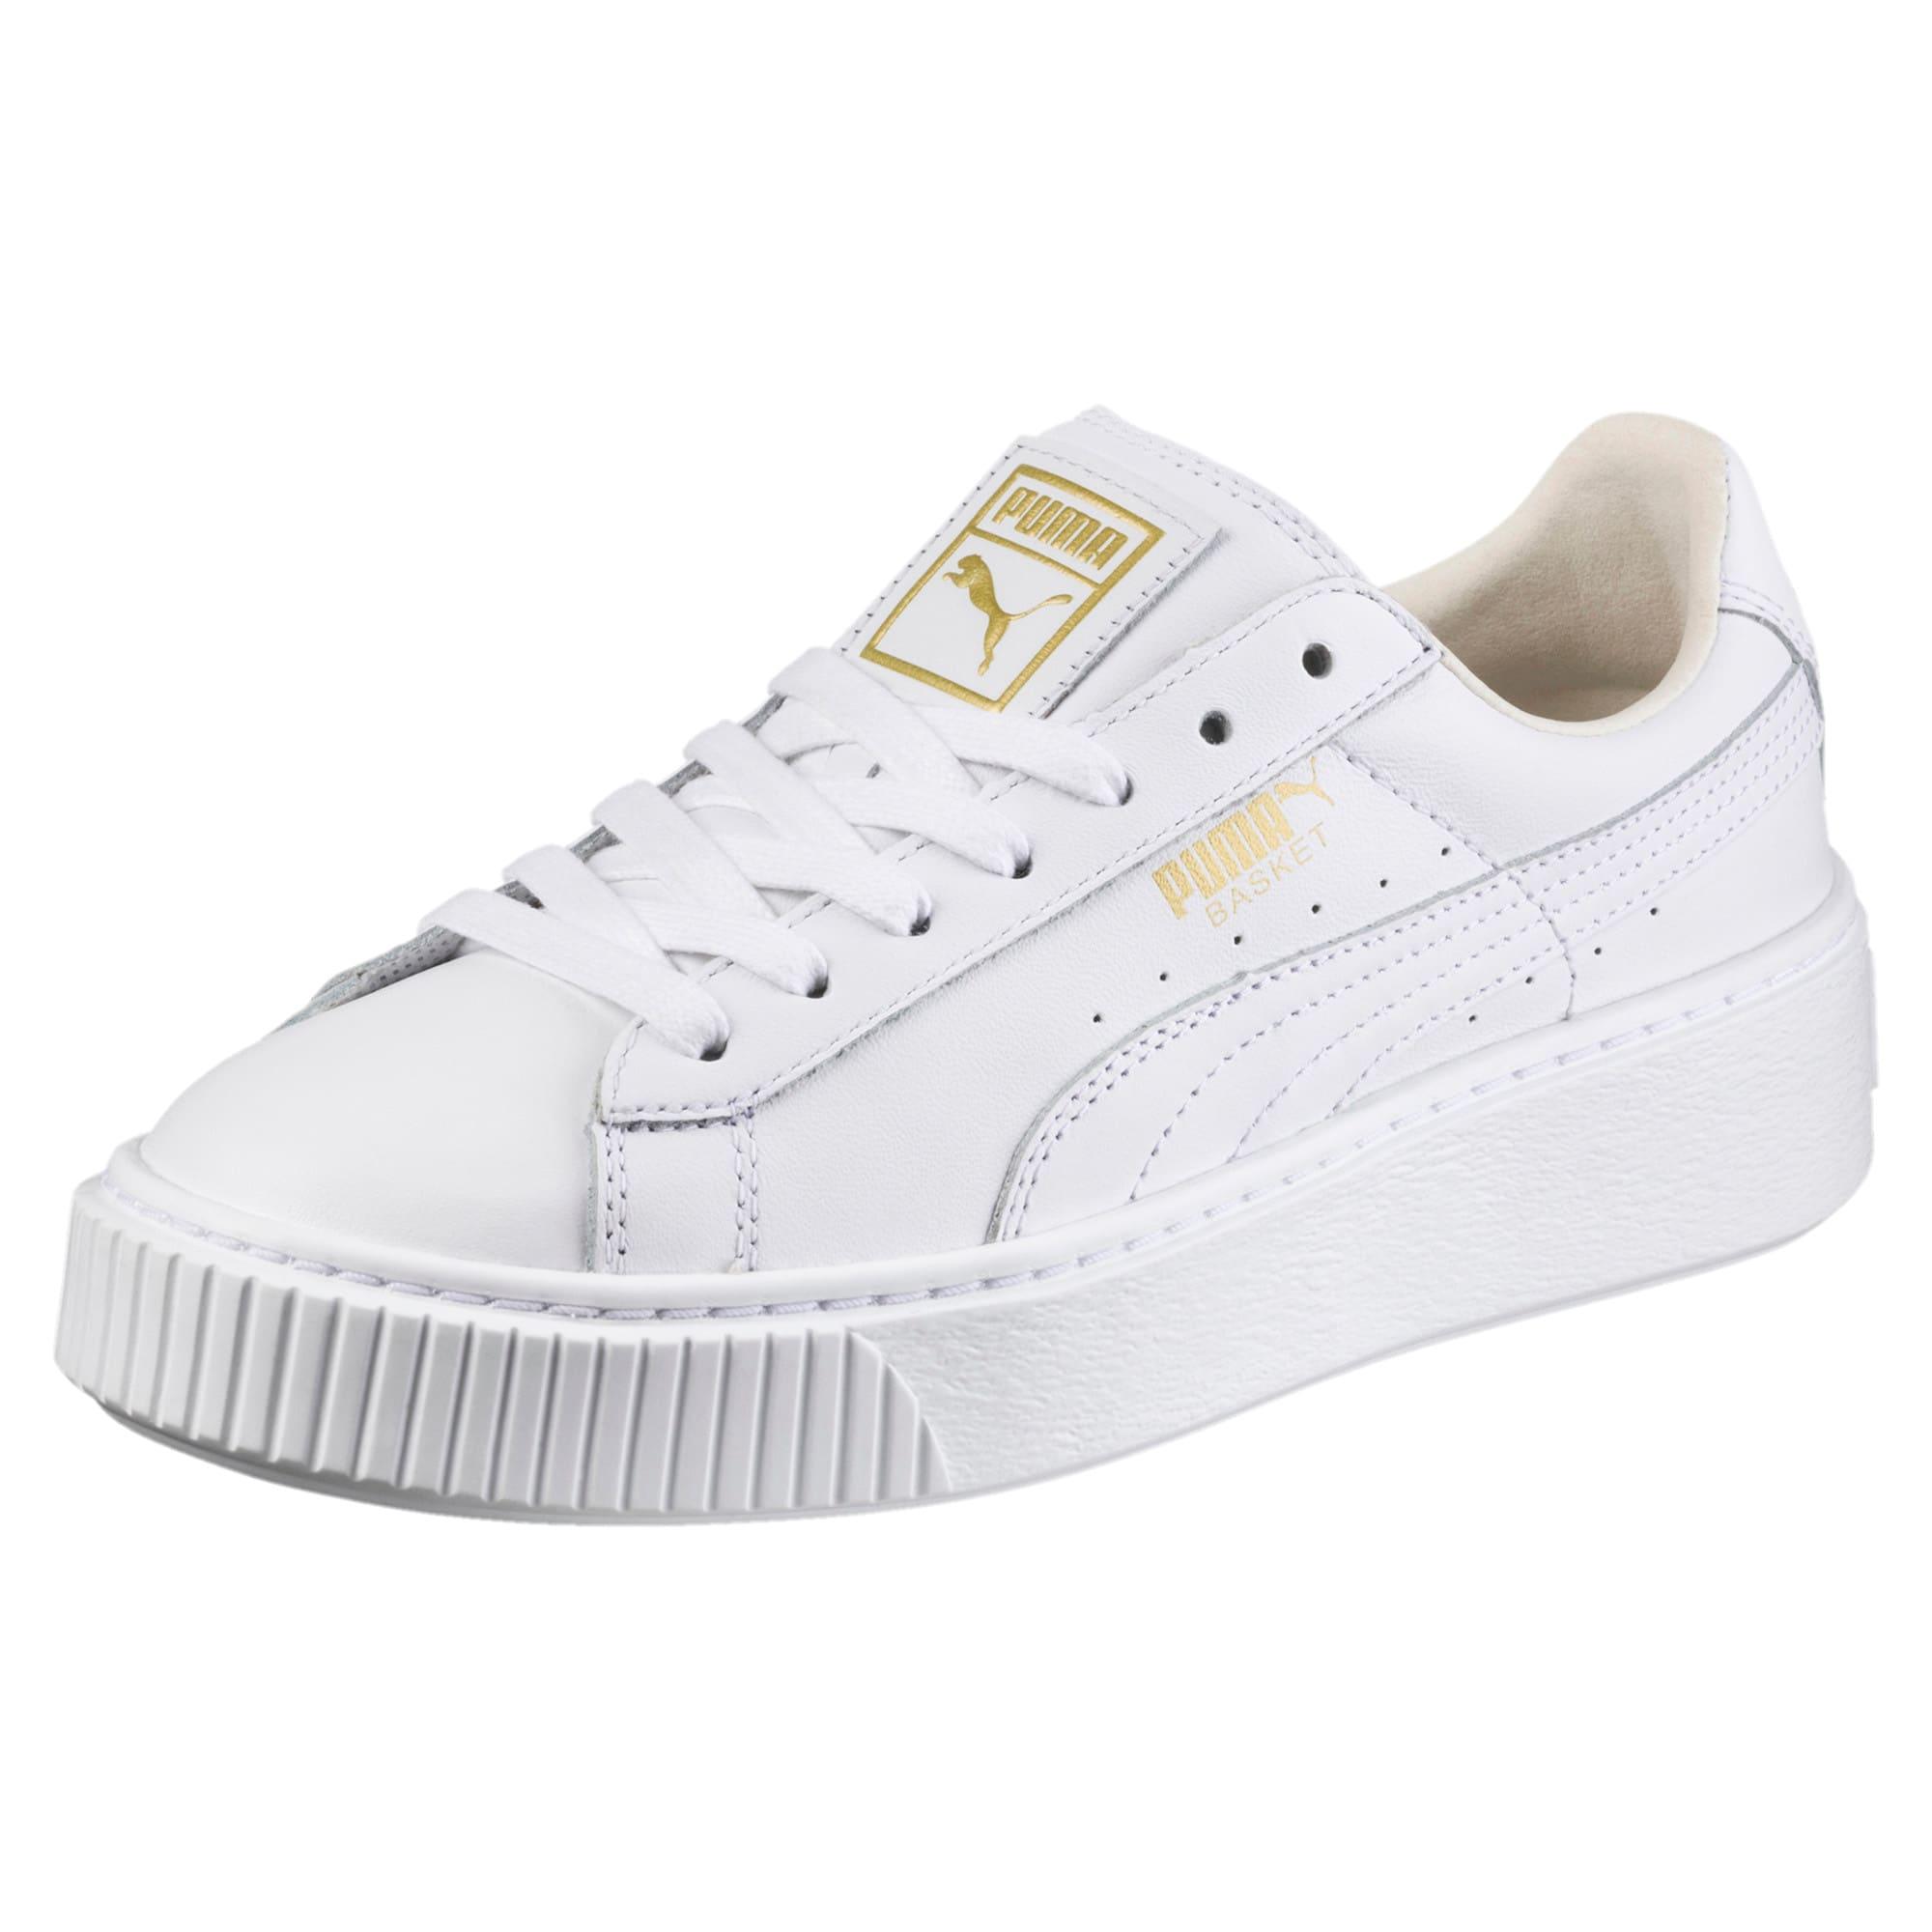 Thumbnail 1 of Basket Platform Core Women's Sneakers, Puma White-Gold, medium